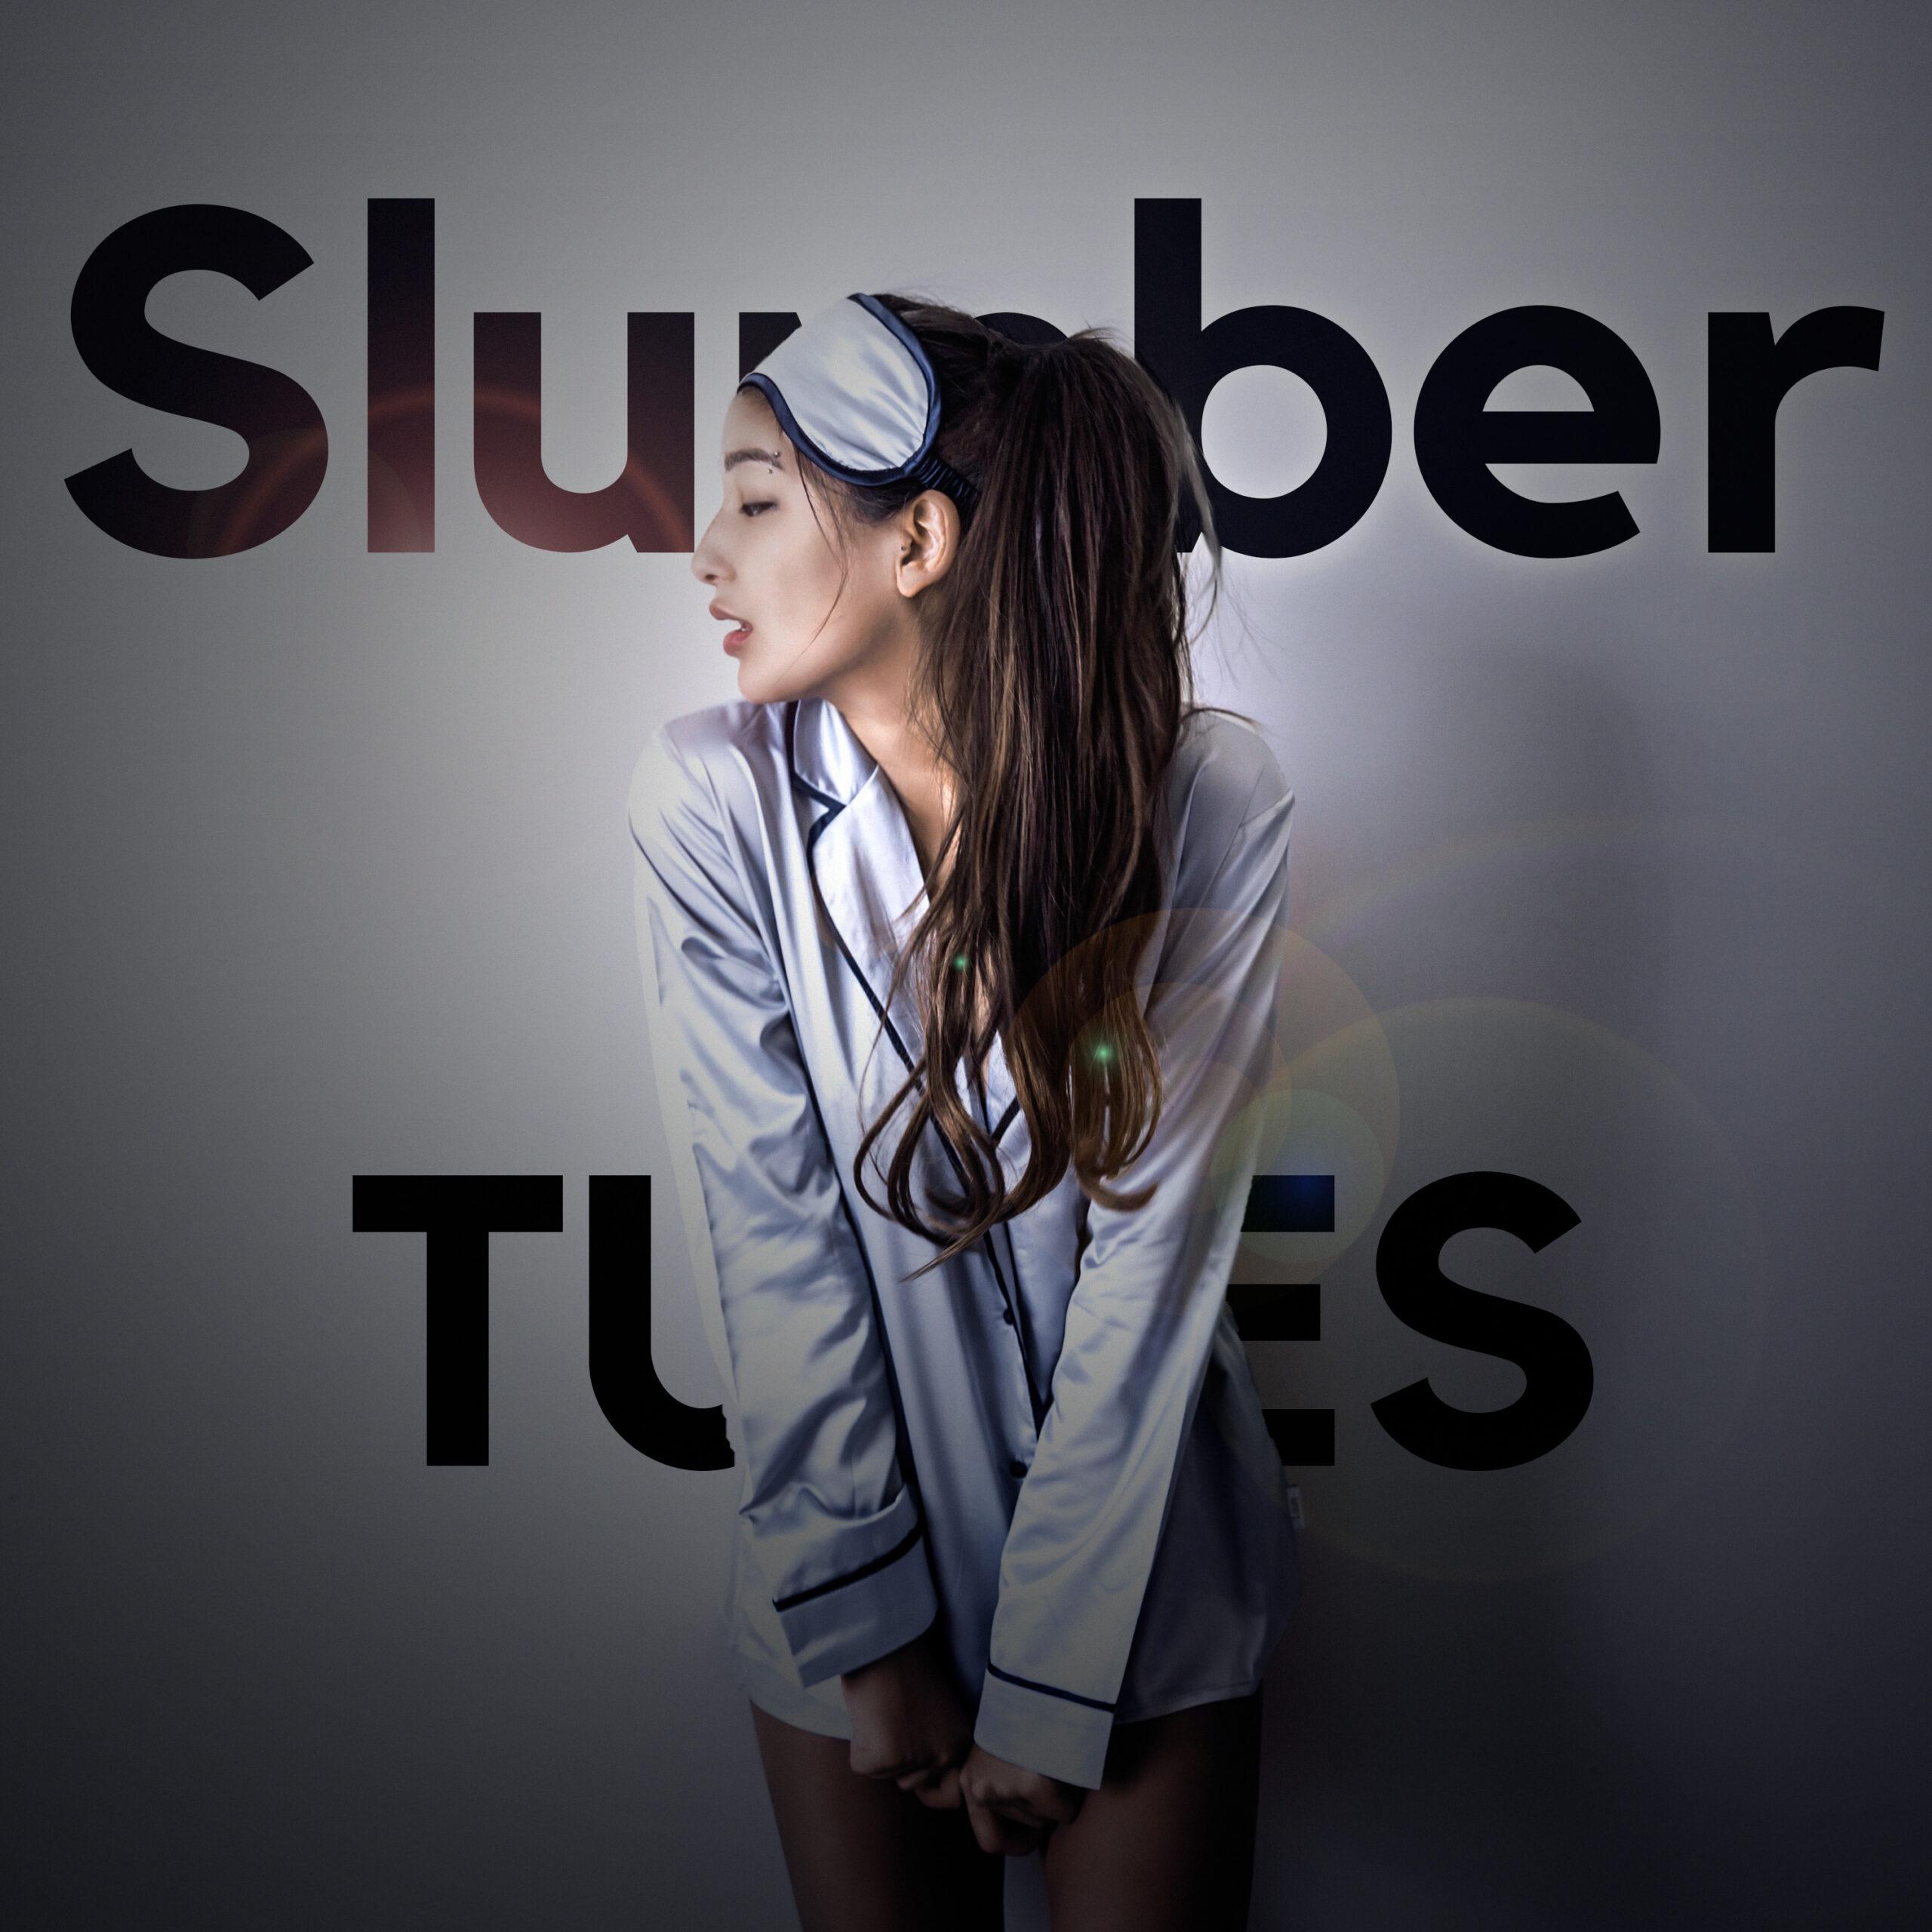 Slumber Tunes